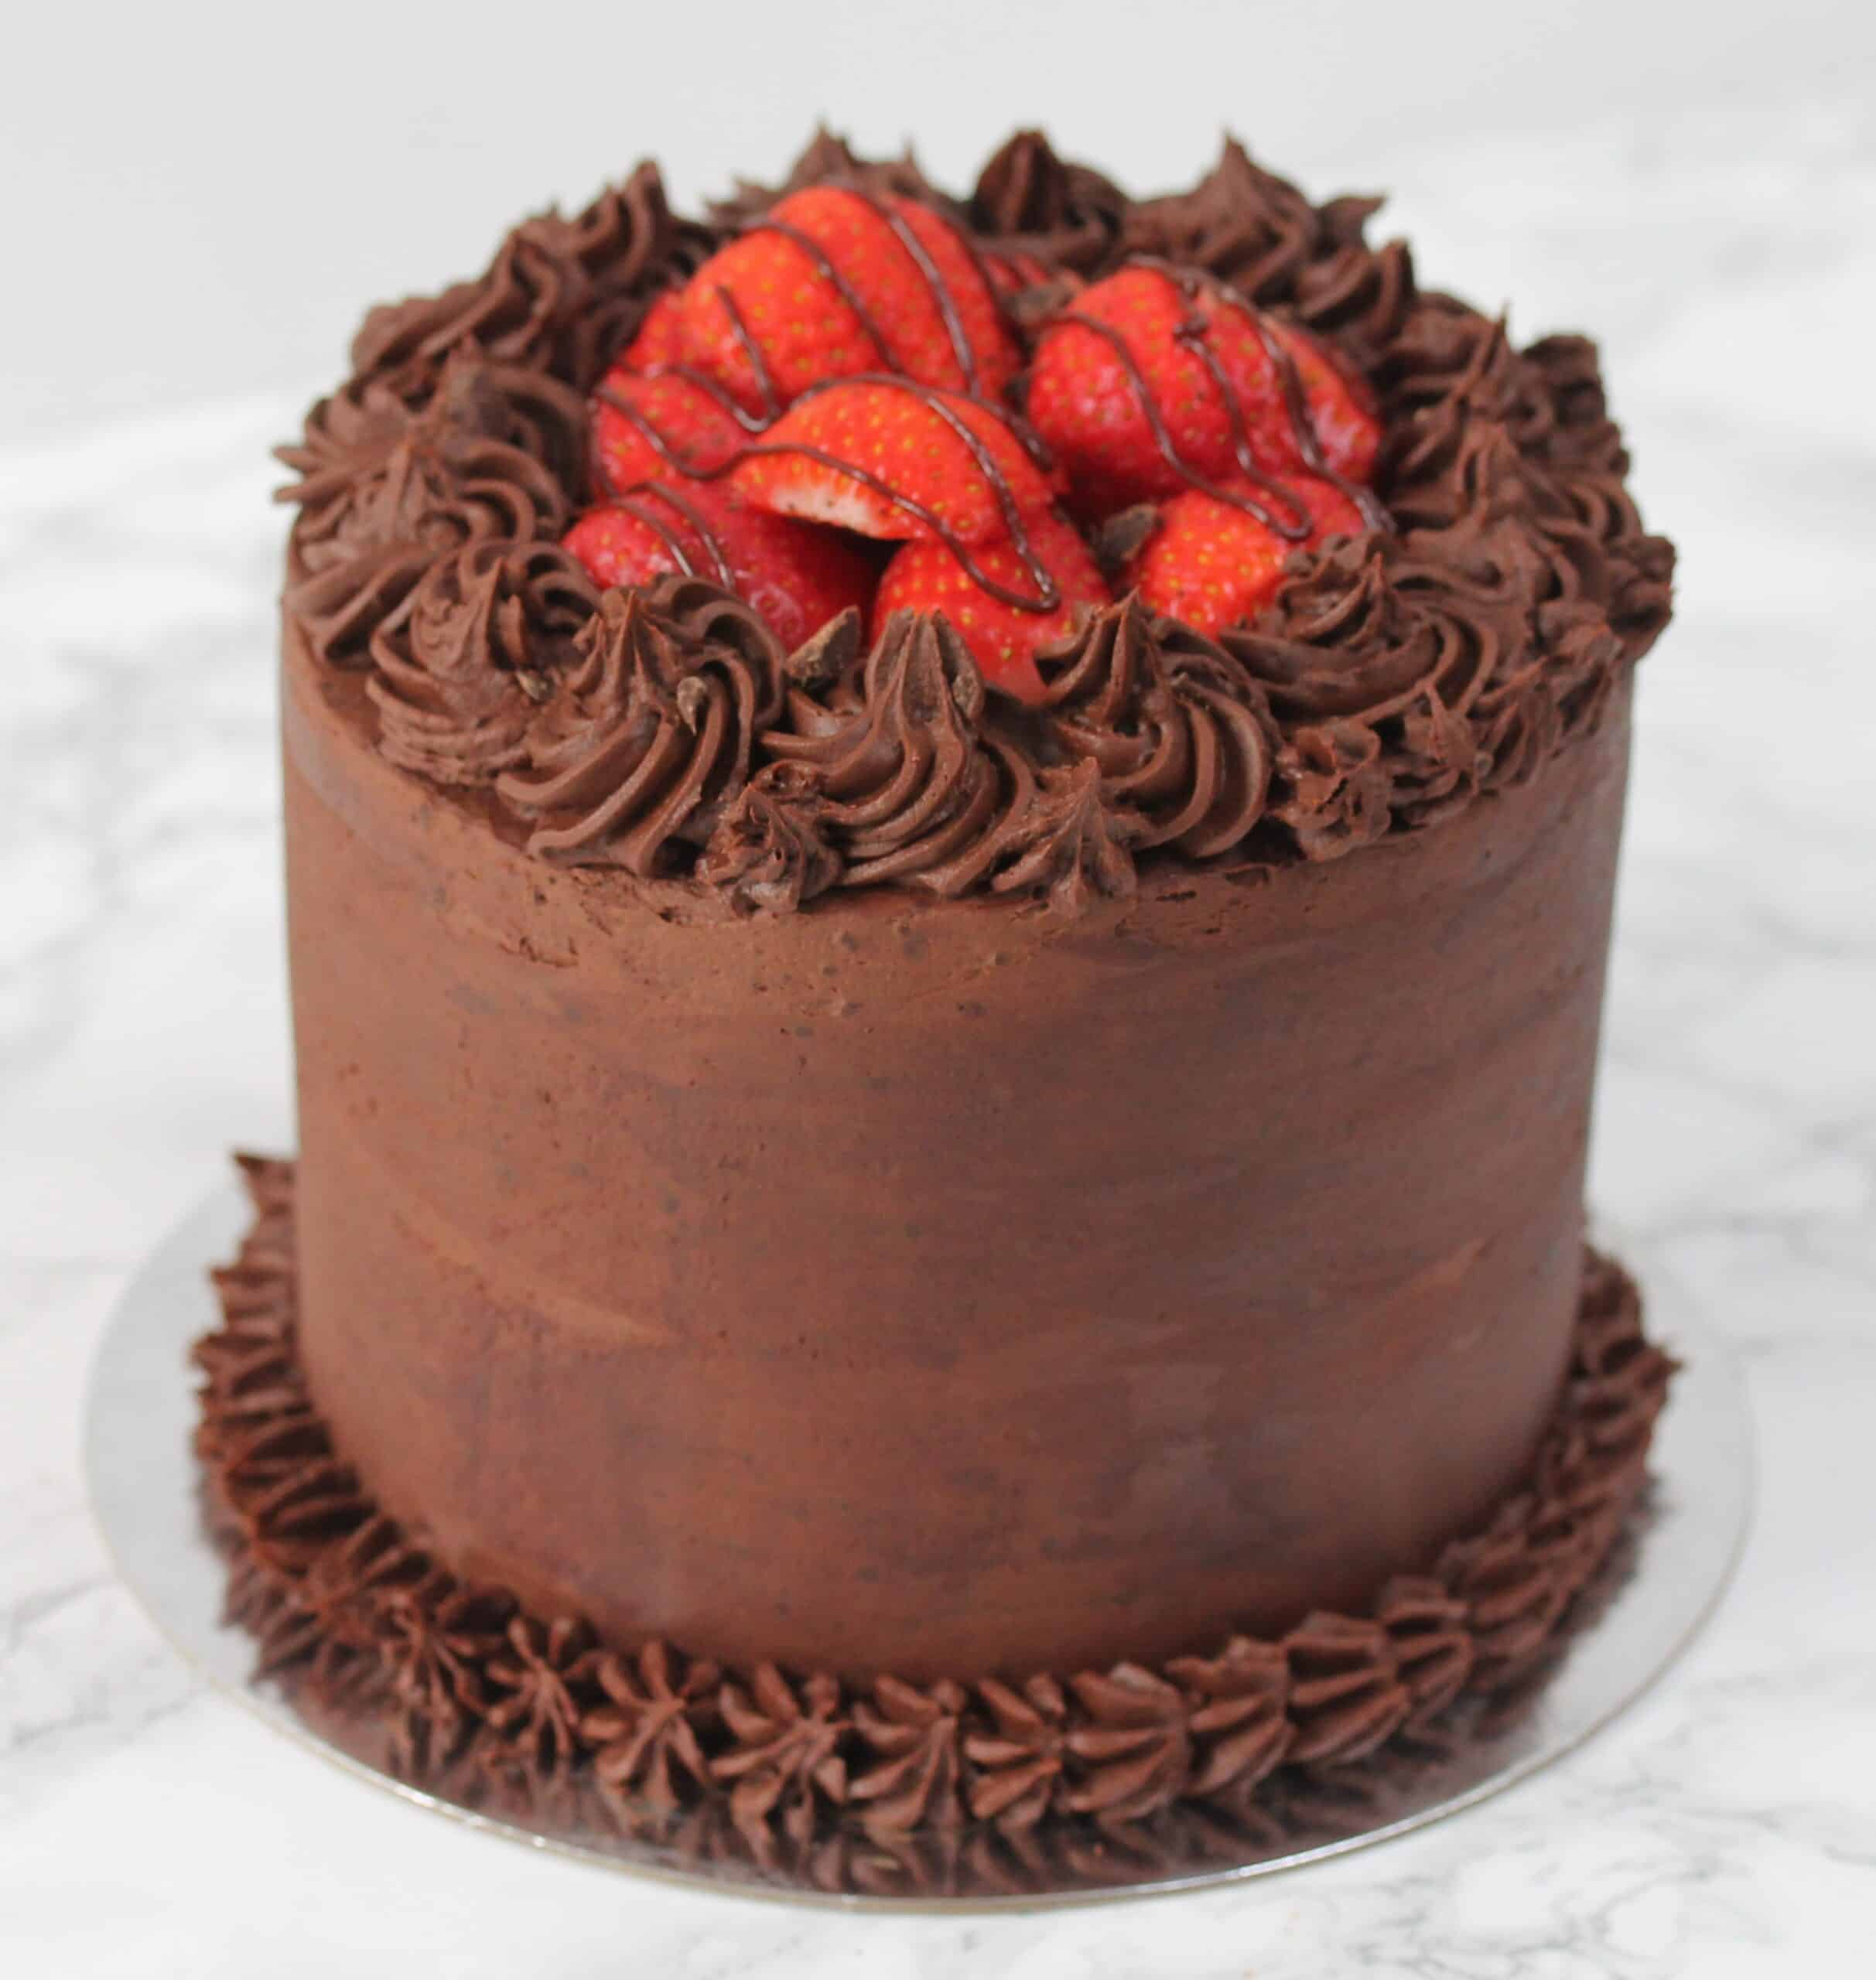 Chocolate Ganache Filling (3)